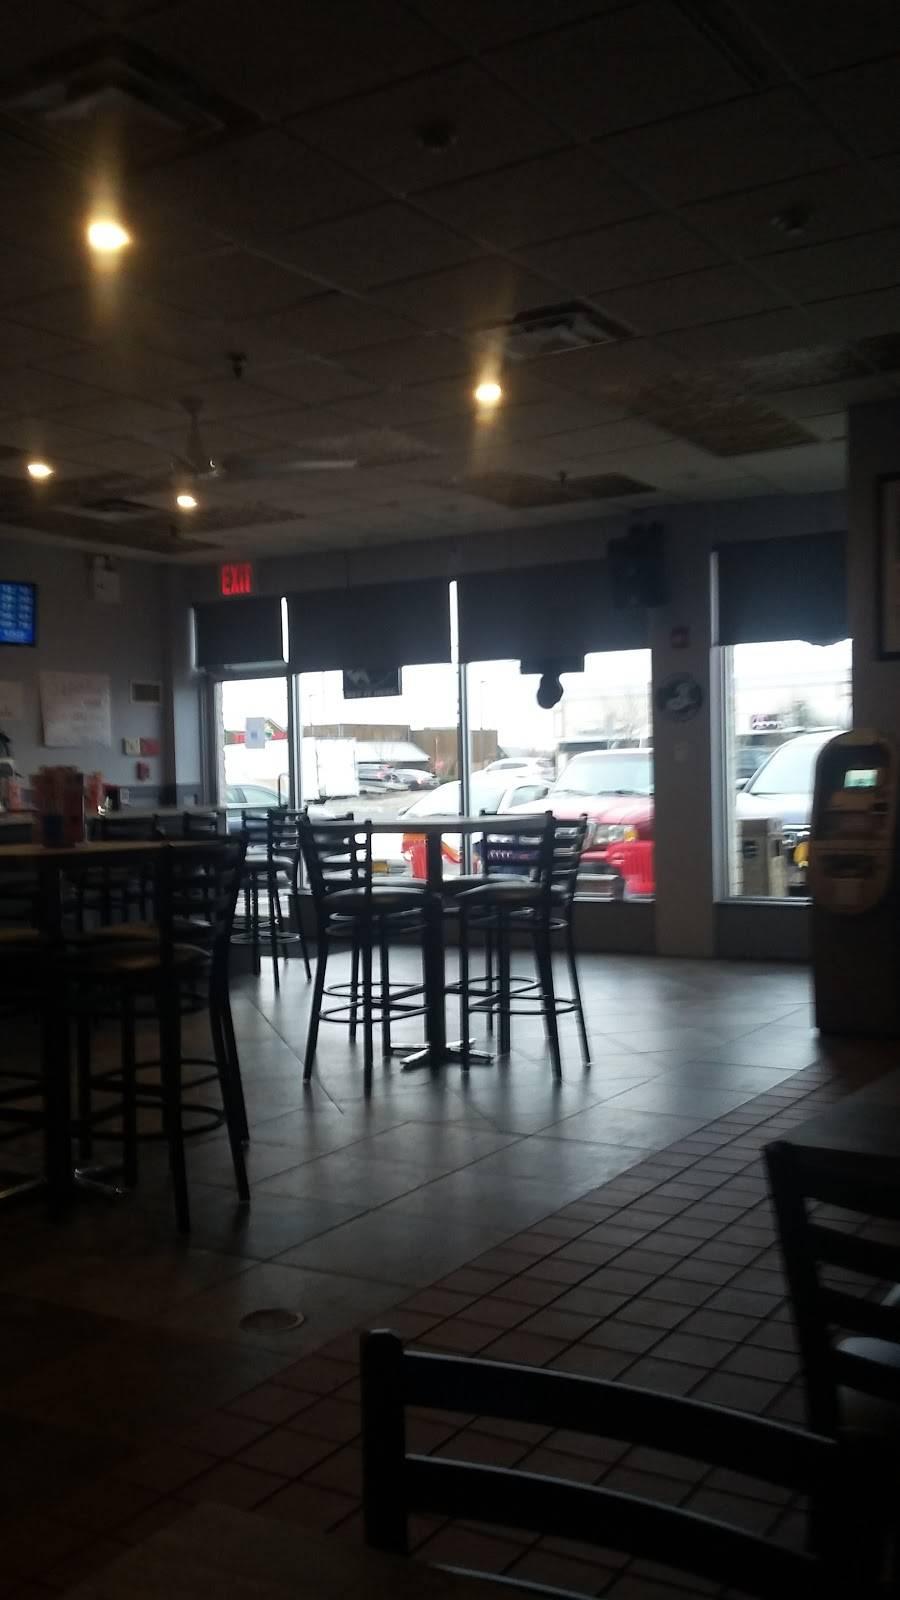 Edgewood Bar & Grill   restaurant   511 Commack Rd # A, Deer Park, NY 11729, USA   6316673030 OR +1 631-667-3030